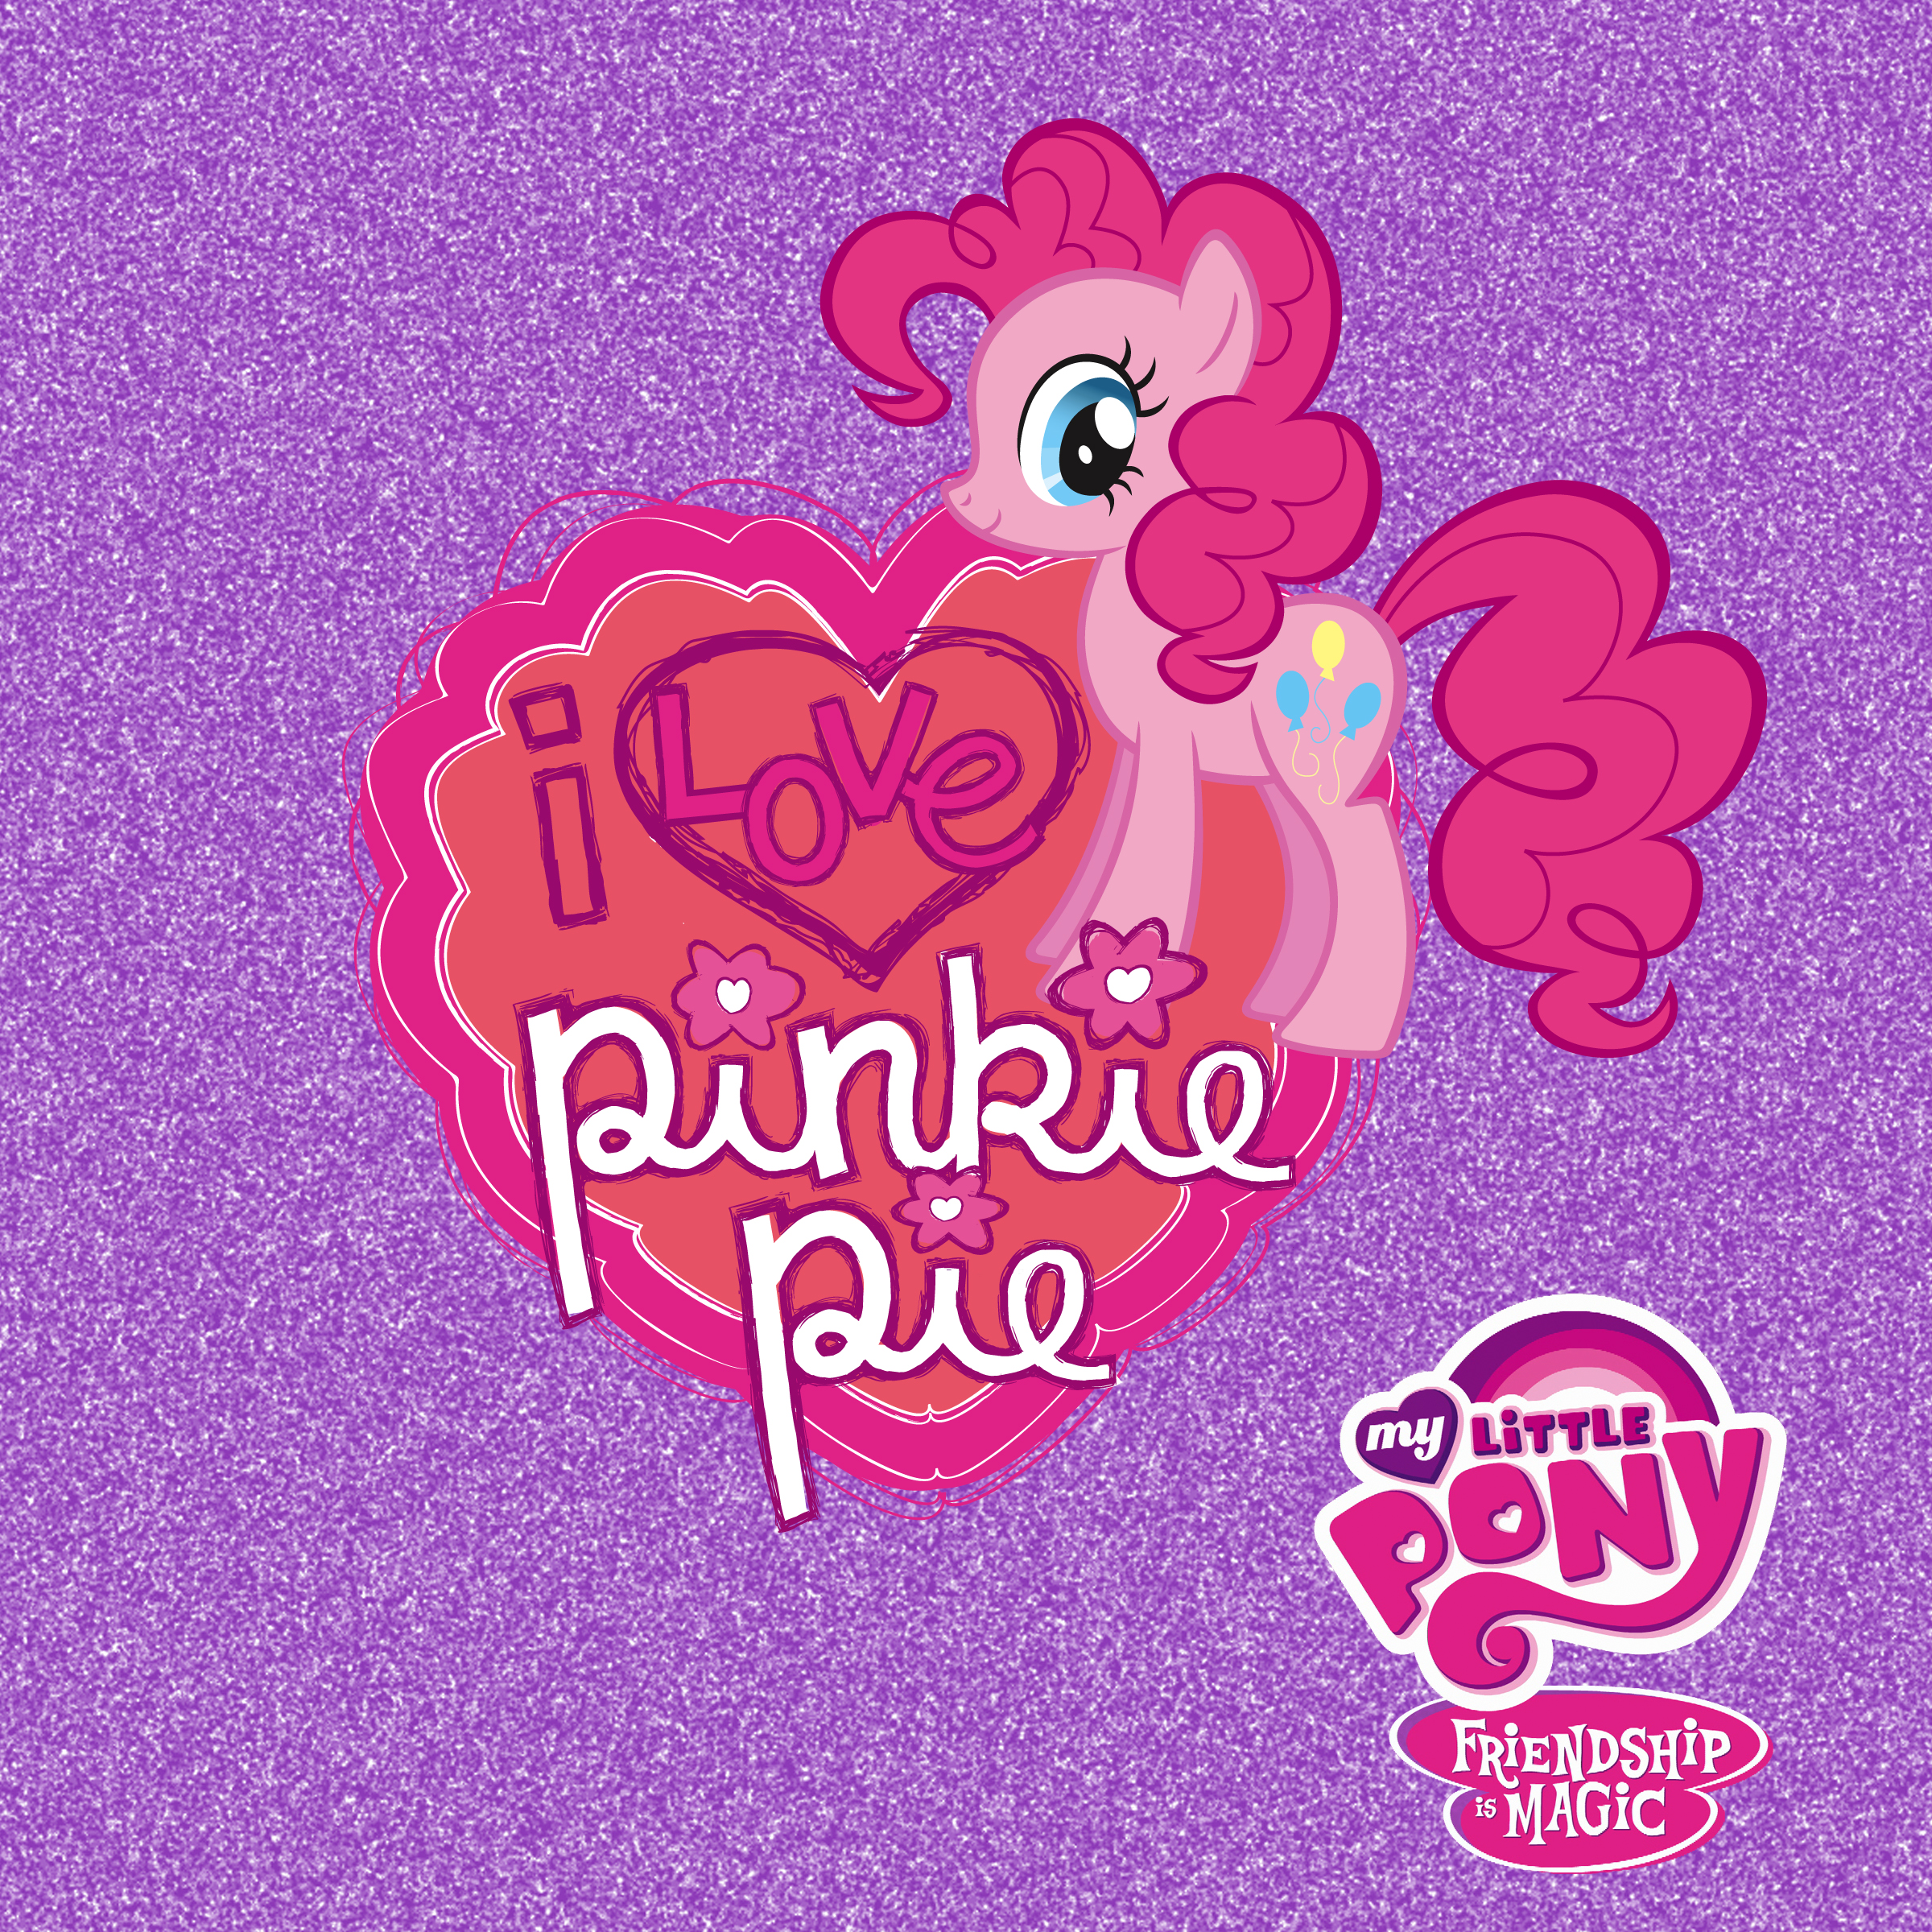 My Little Pony Friendship is Magic: Best of Pinkie Pie